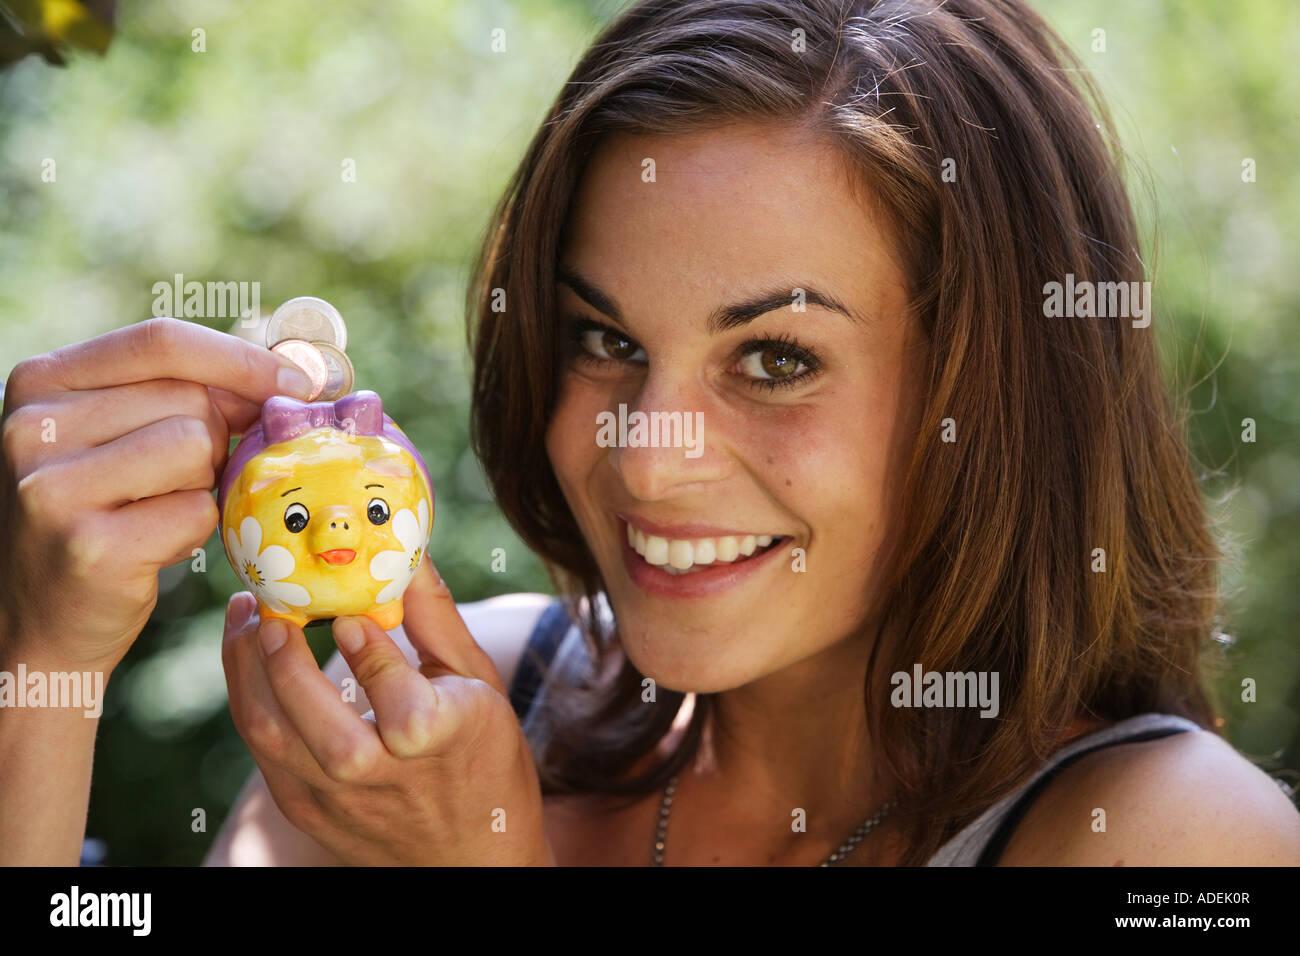 Young woman puts money into a piggy bank © Peter Schatz/Alamy - Stock Image